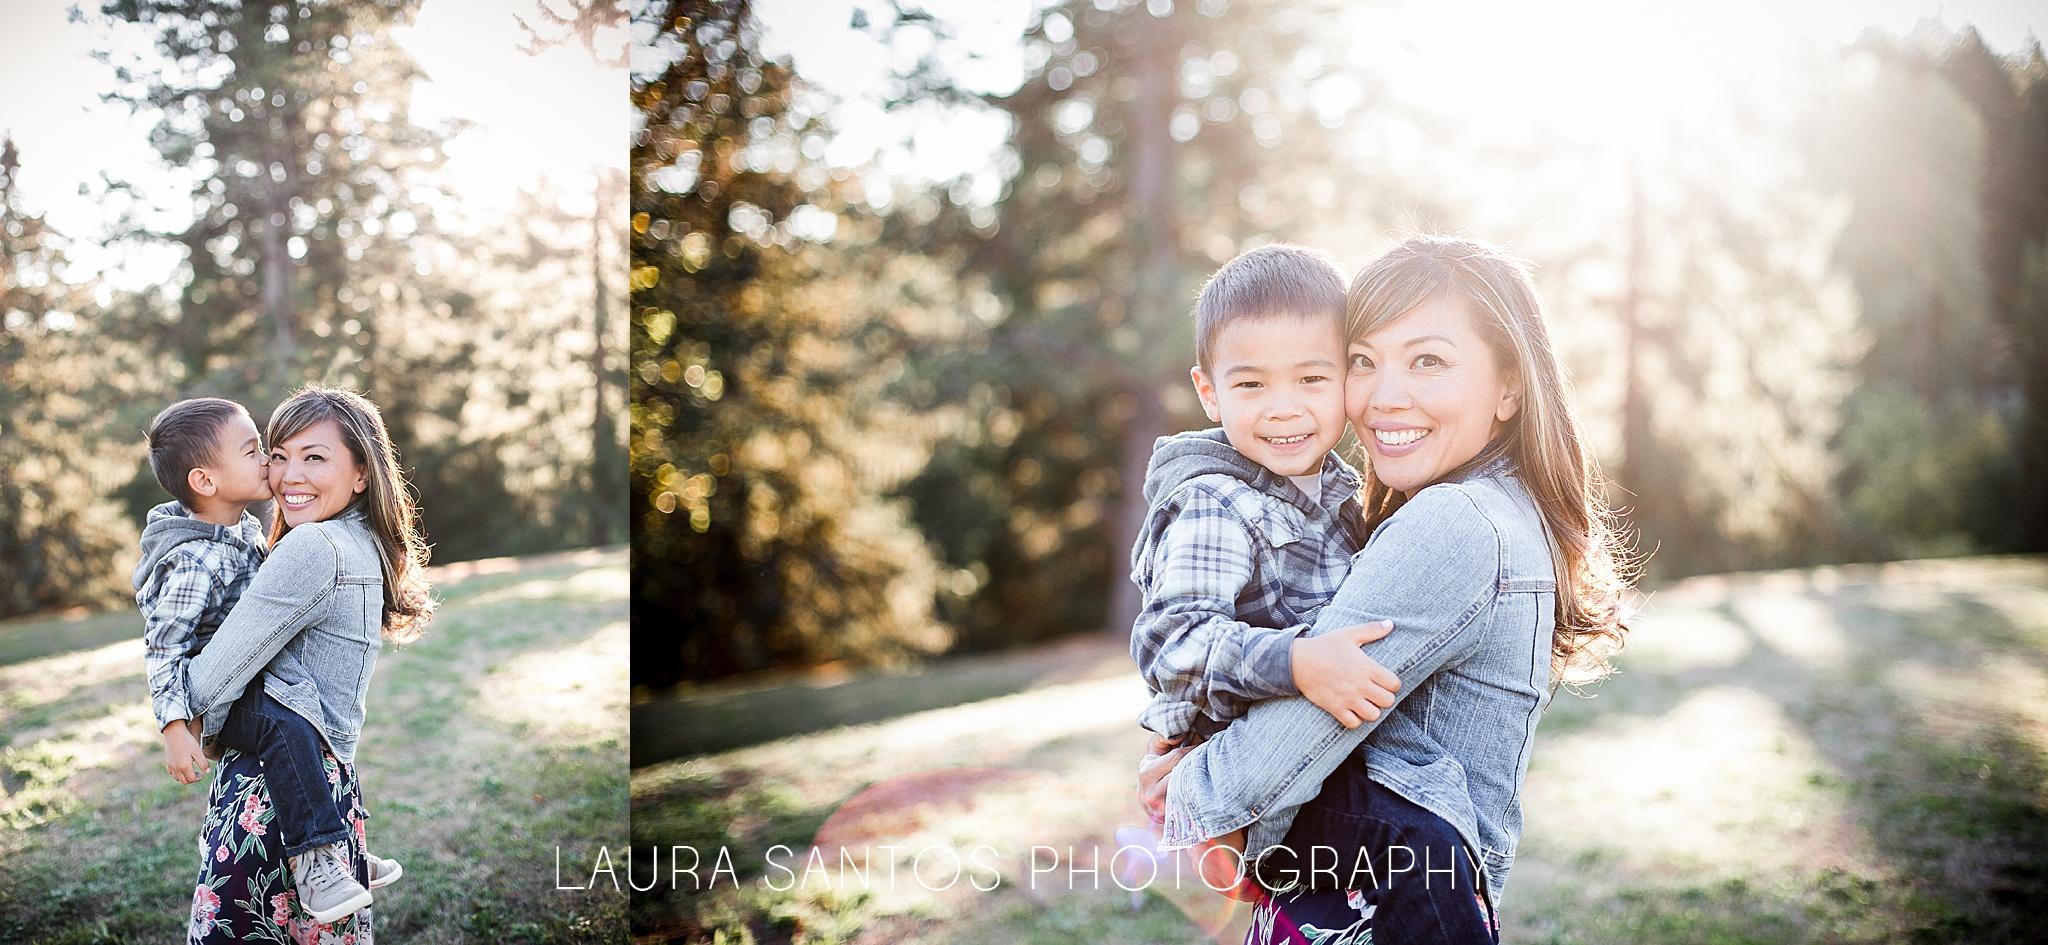 Laura Santos Photography Portland Oregon Family Photographer_0750.jpg